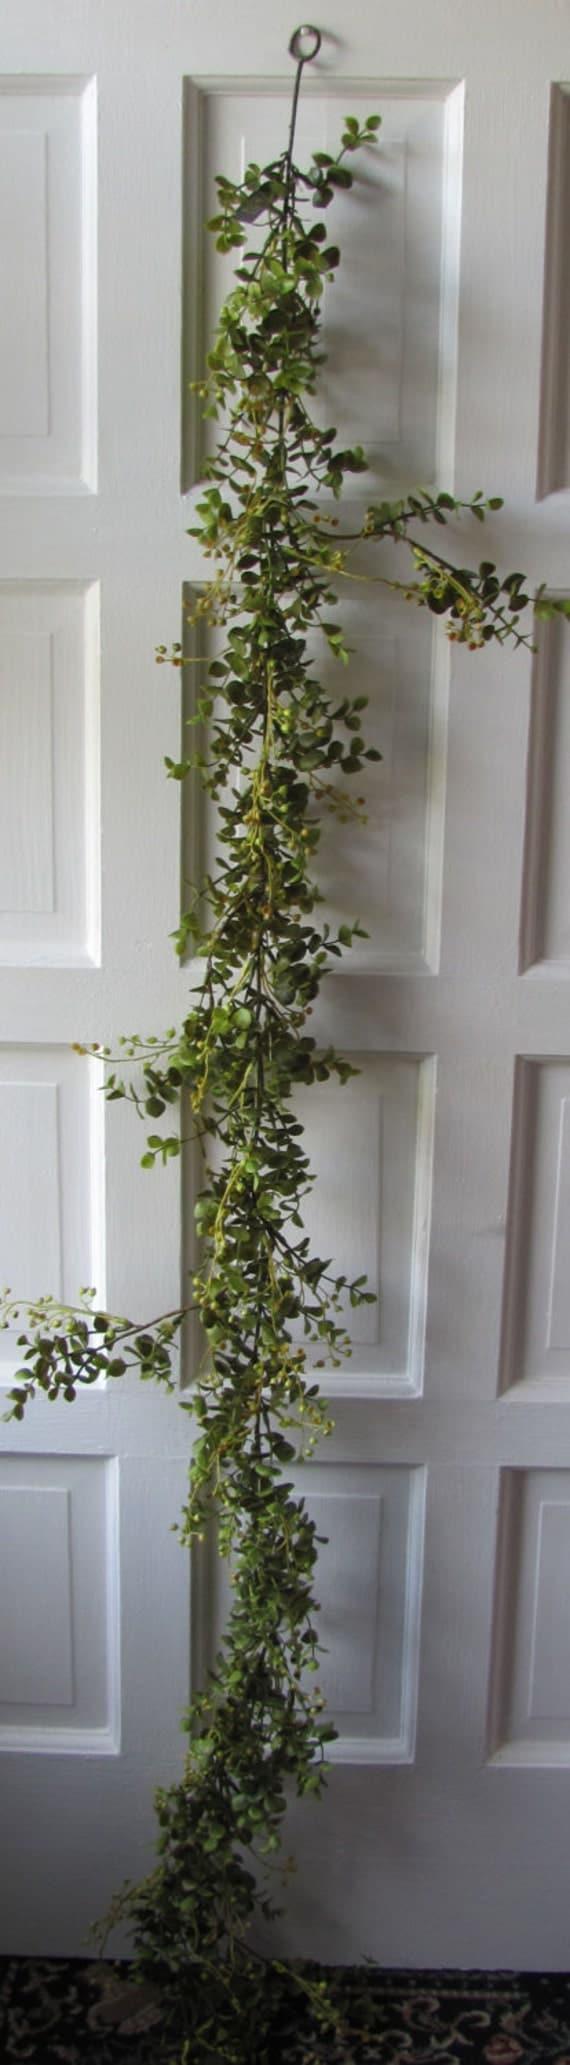 eucalyptus garland artificial floral greens wedding. Black Bedroom Furniture Sets. Home Design Ideas